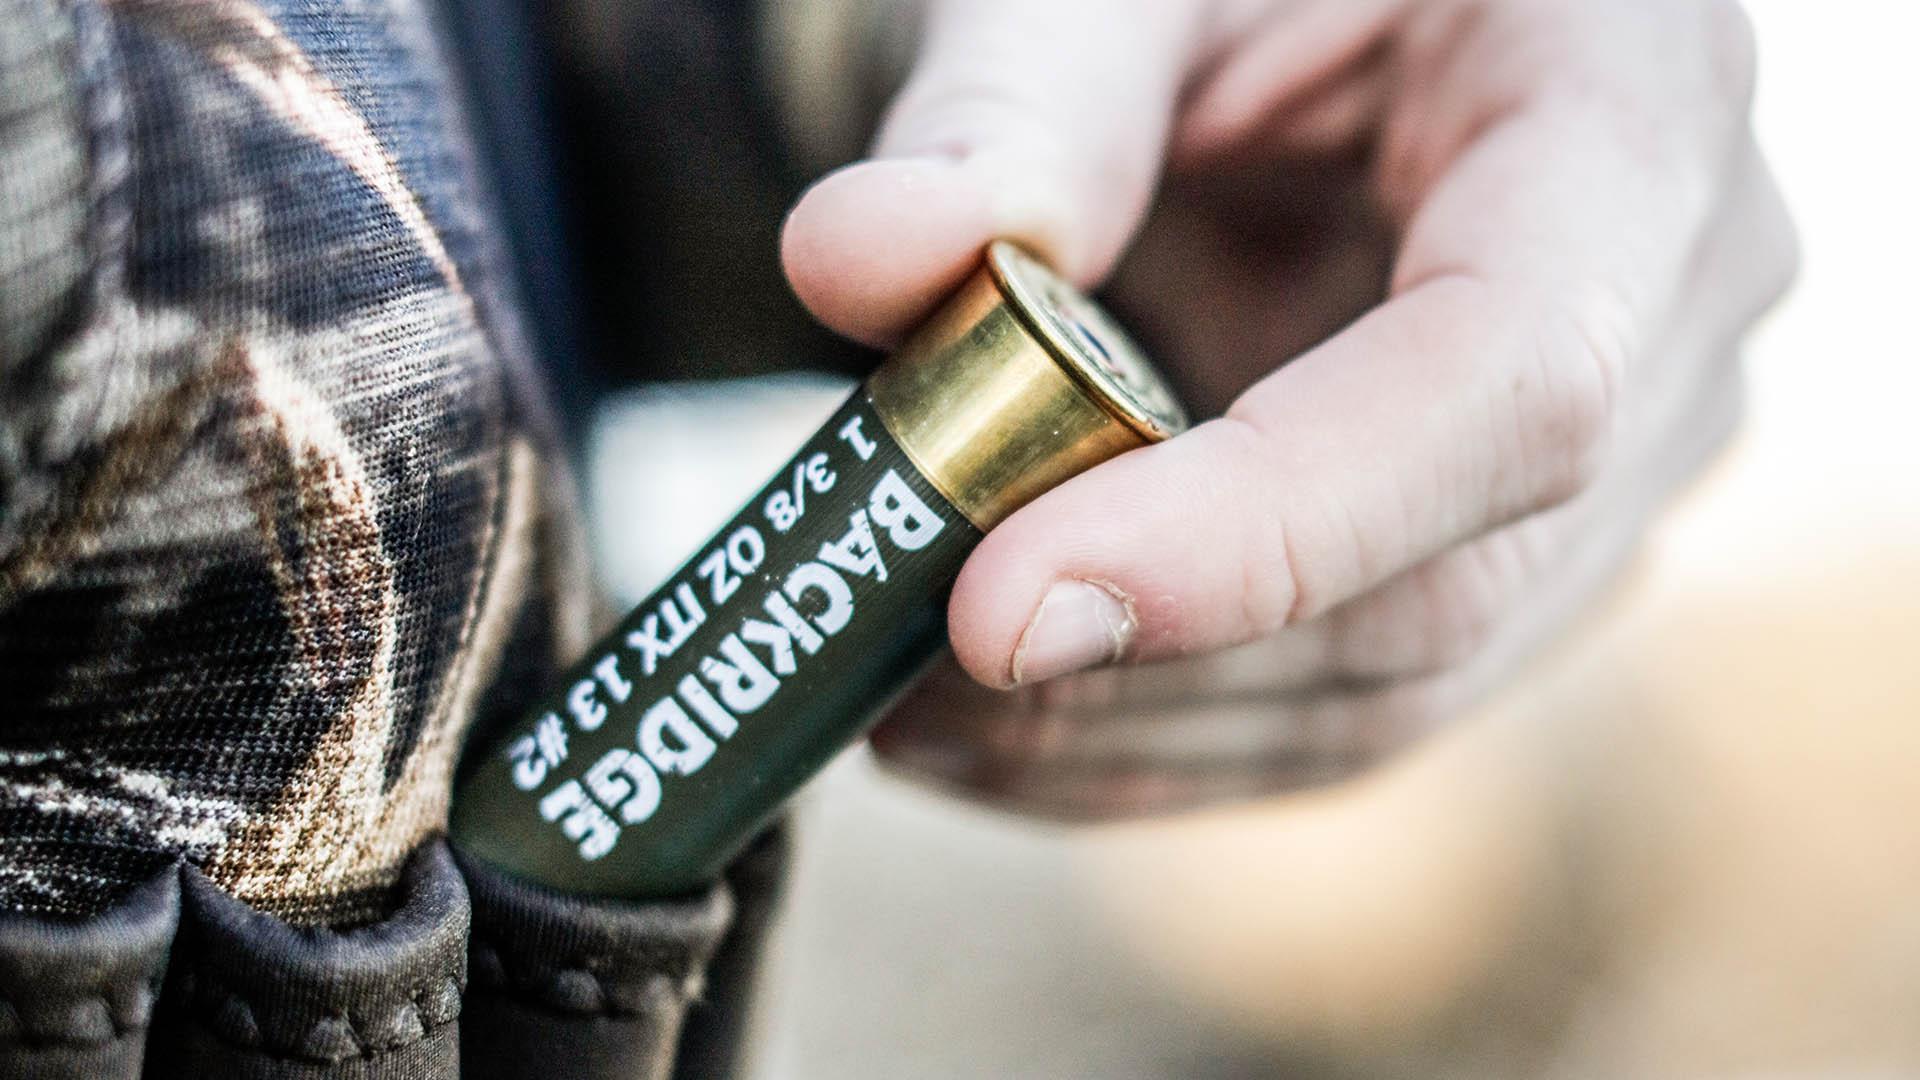 backridge-ammunition-photos-0002-noved-228.jpg